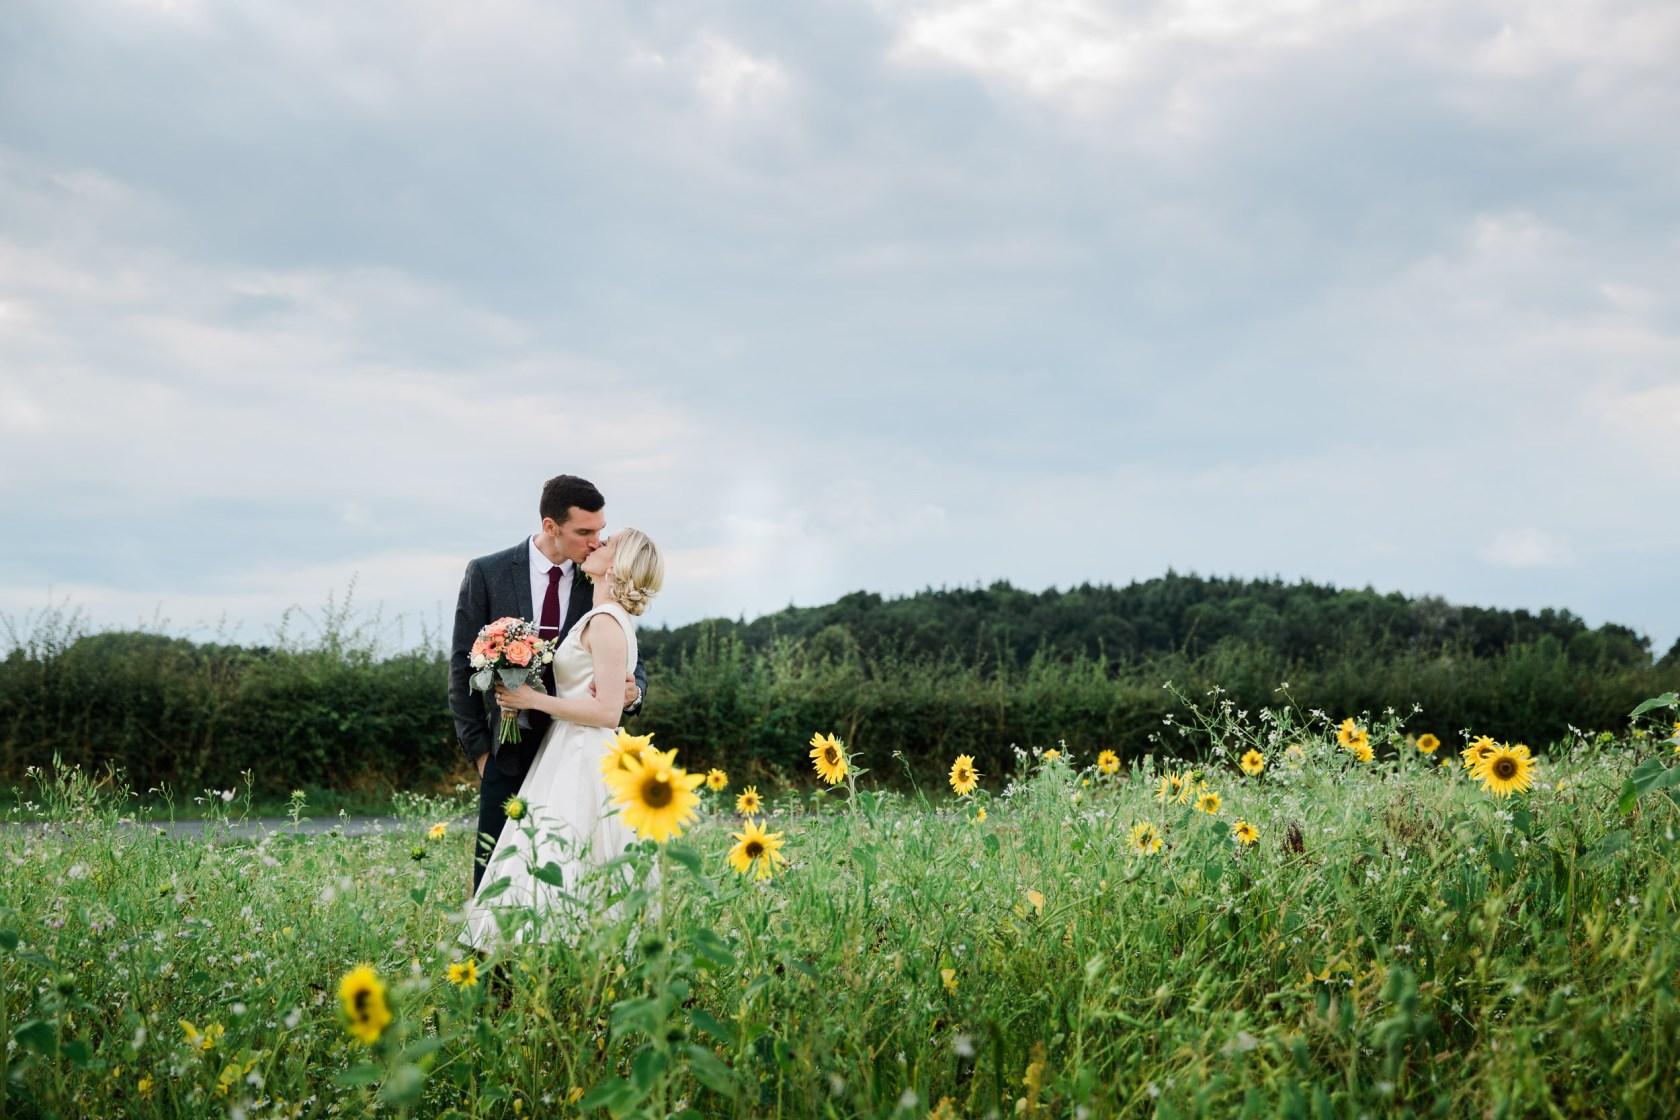 Swallows Nest Barn Chic & Rustic Wedding photography